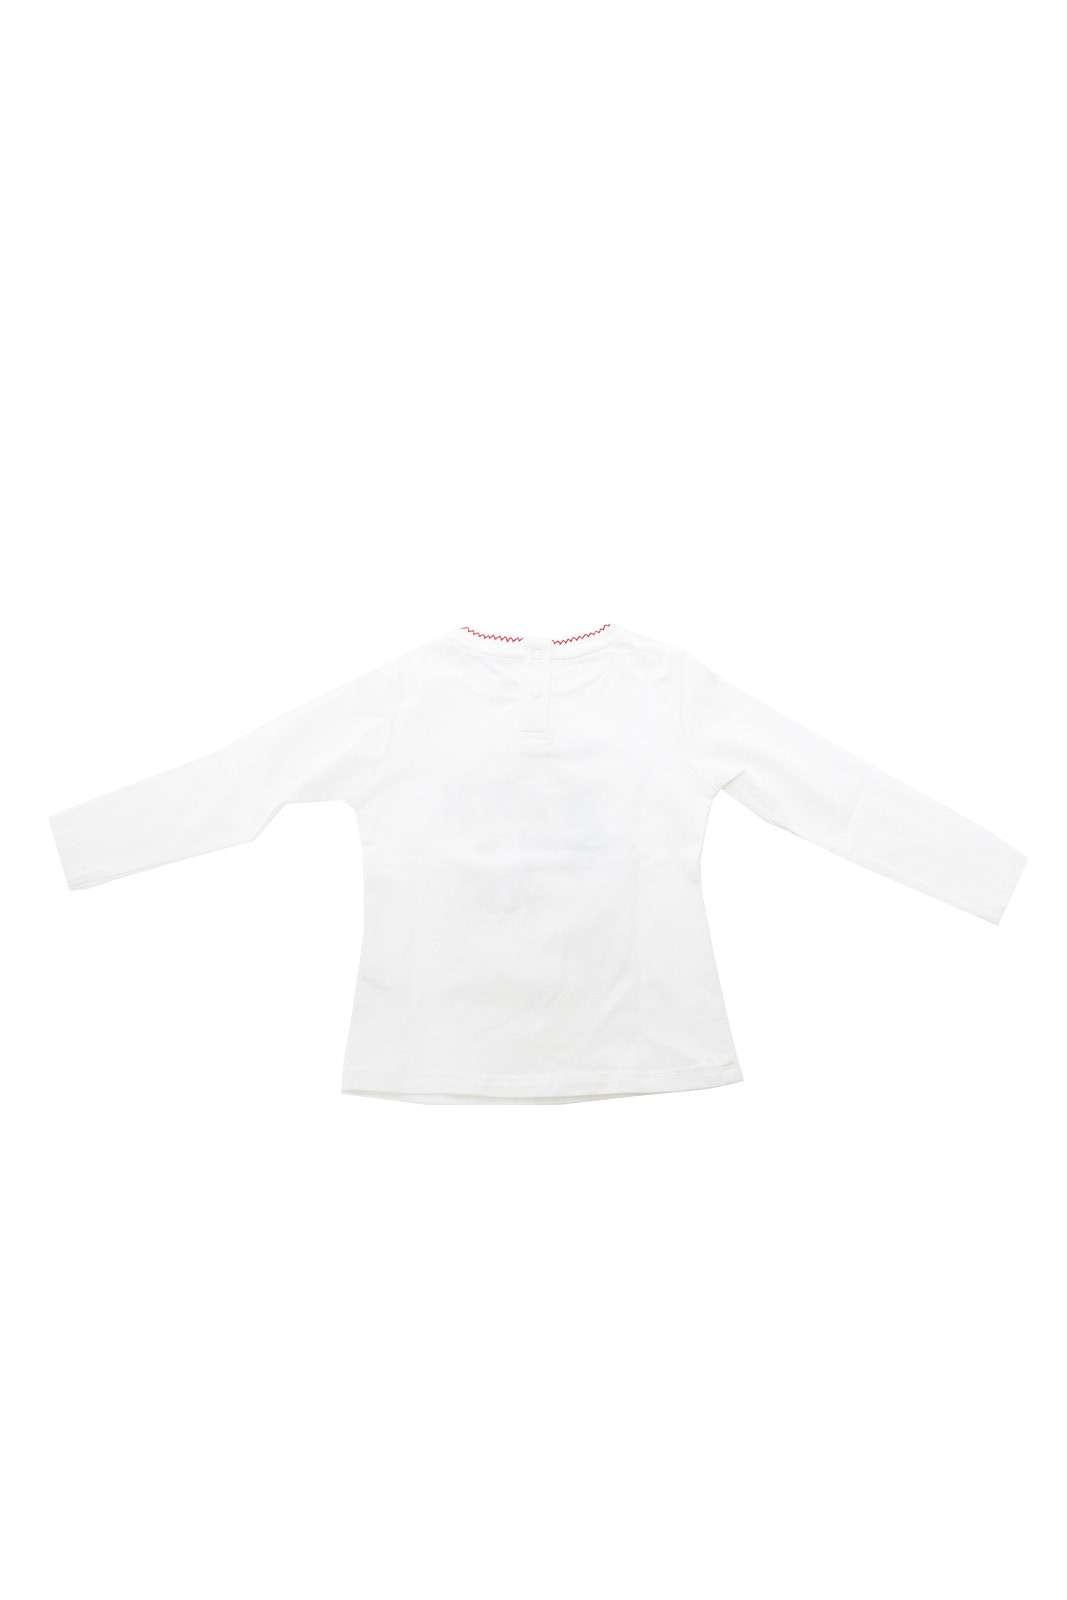 https://www.parmax.com/media/catalog/product/a/i/PE-outlet_parmax-maglia-bambina-Silvian-Heach-NNDI5028TS-B.jpg